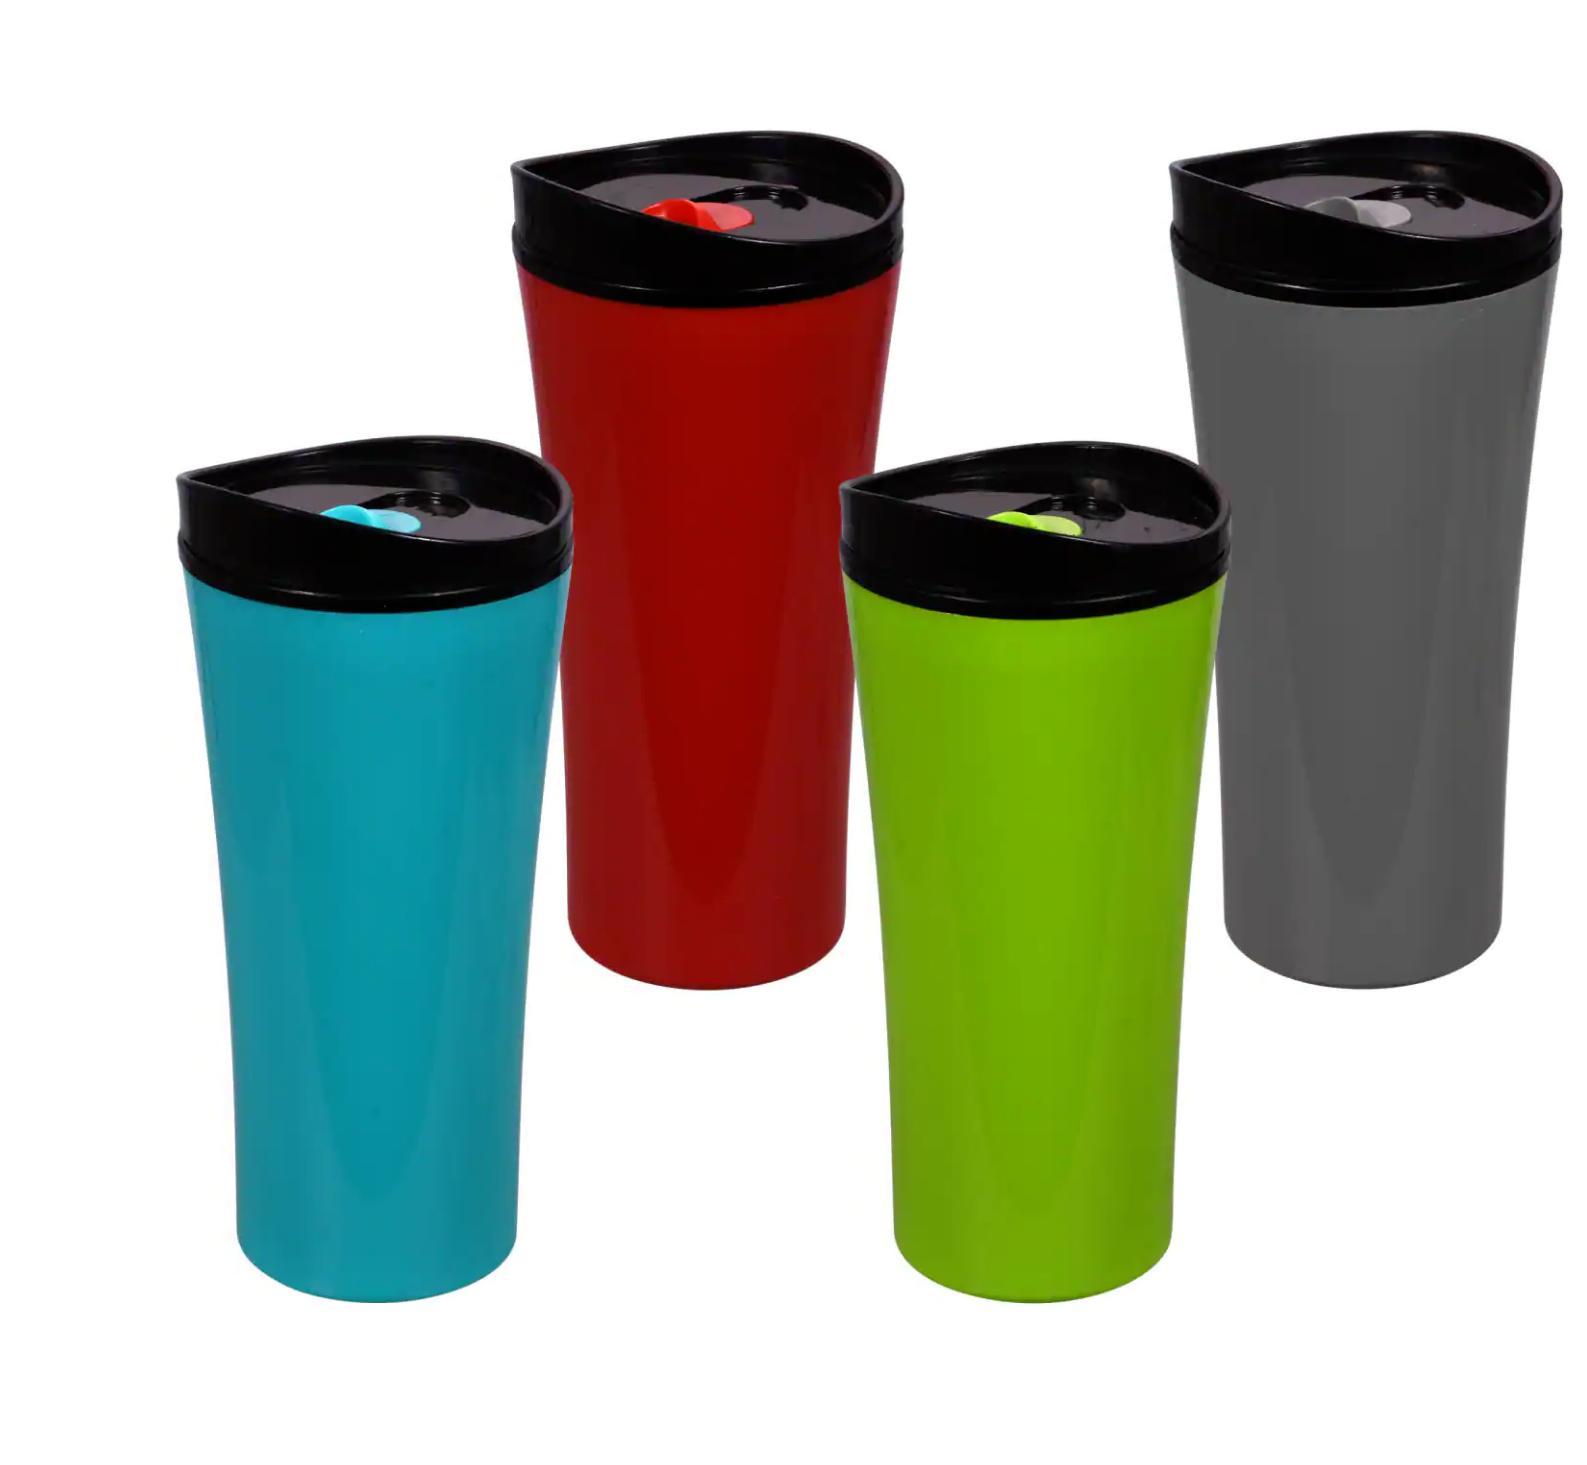 Coffee / Travel Mug Cup Choose  Color Options 16 Ounce $6.49